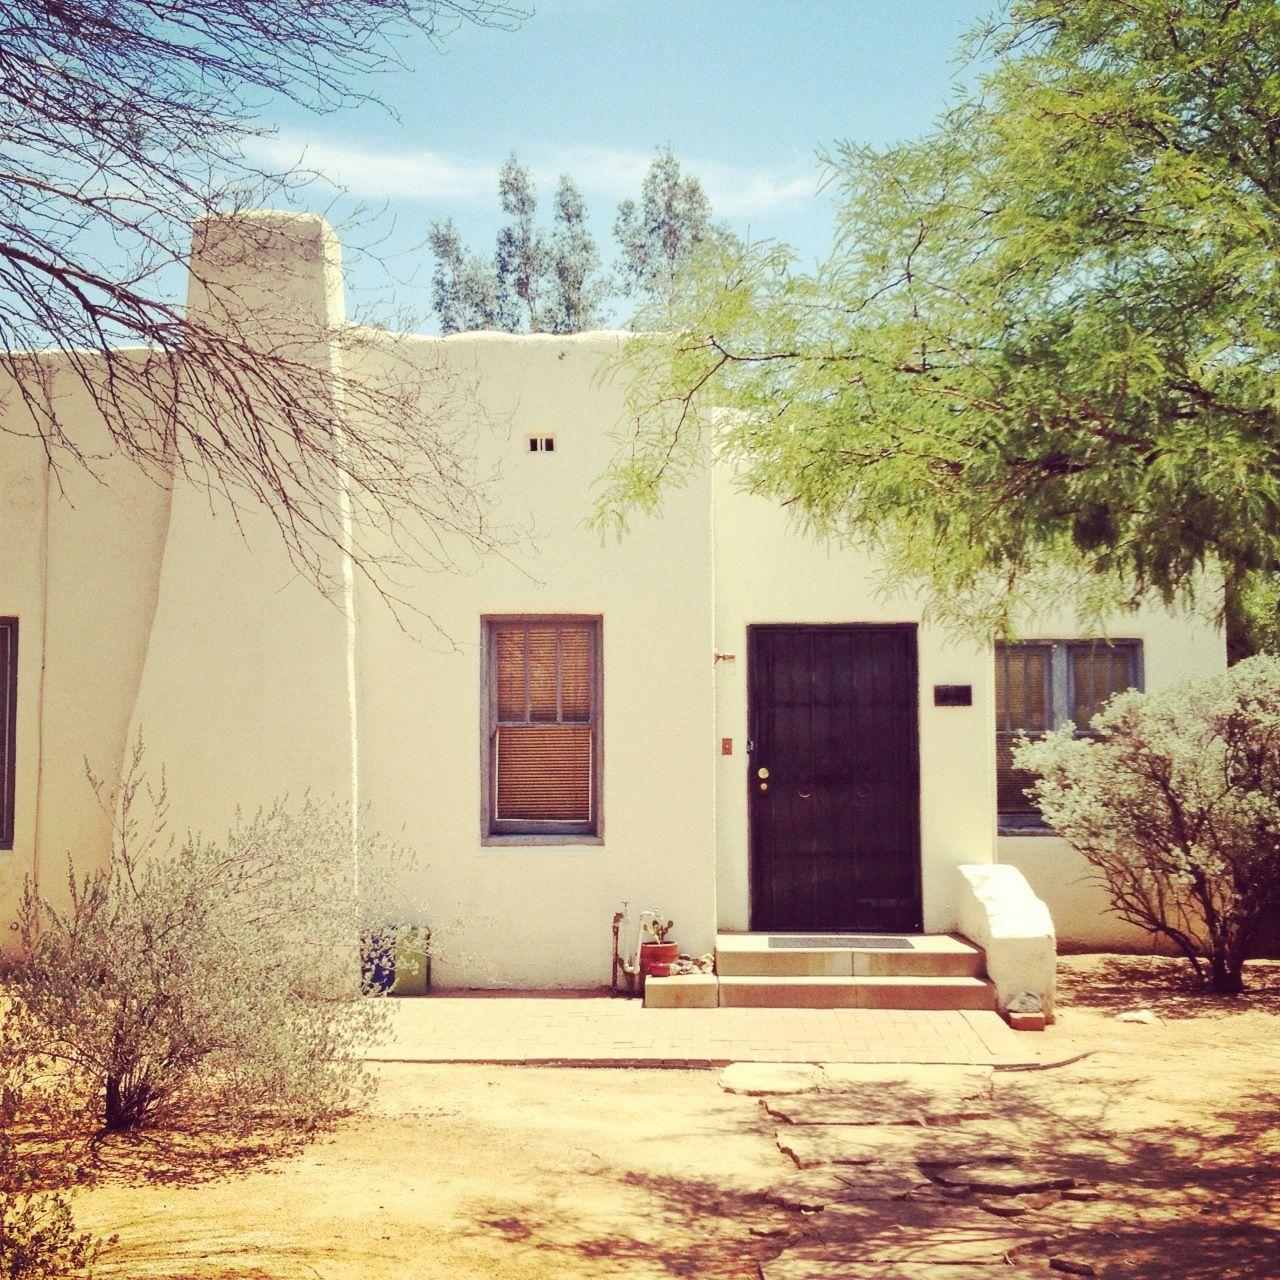 White adobe casita adobe homes earthship cob beautiful landscapes santa fe